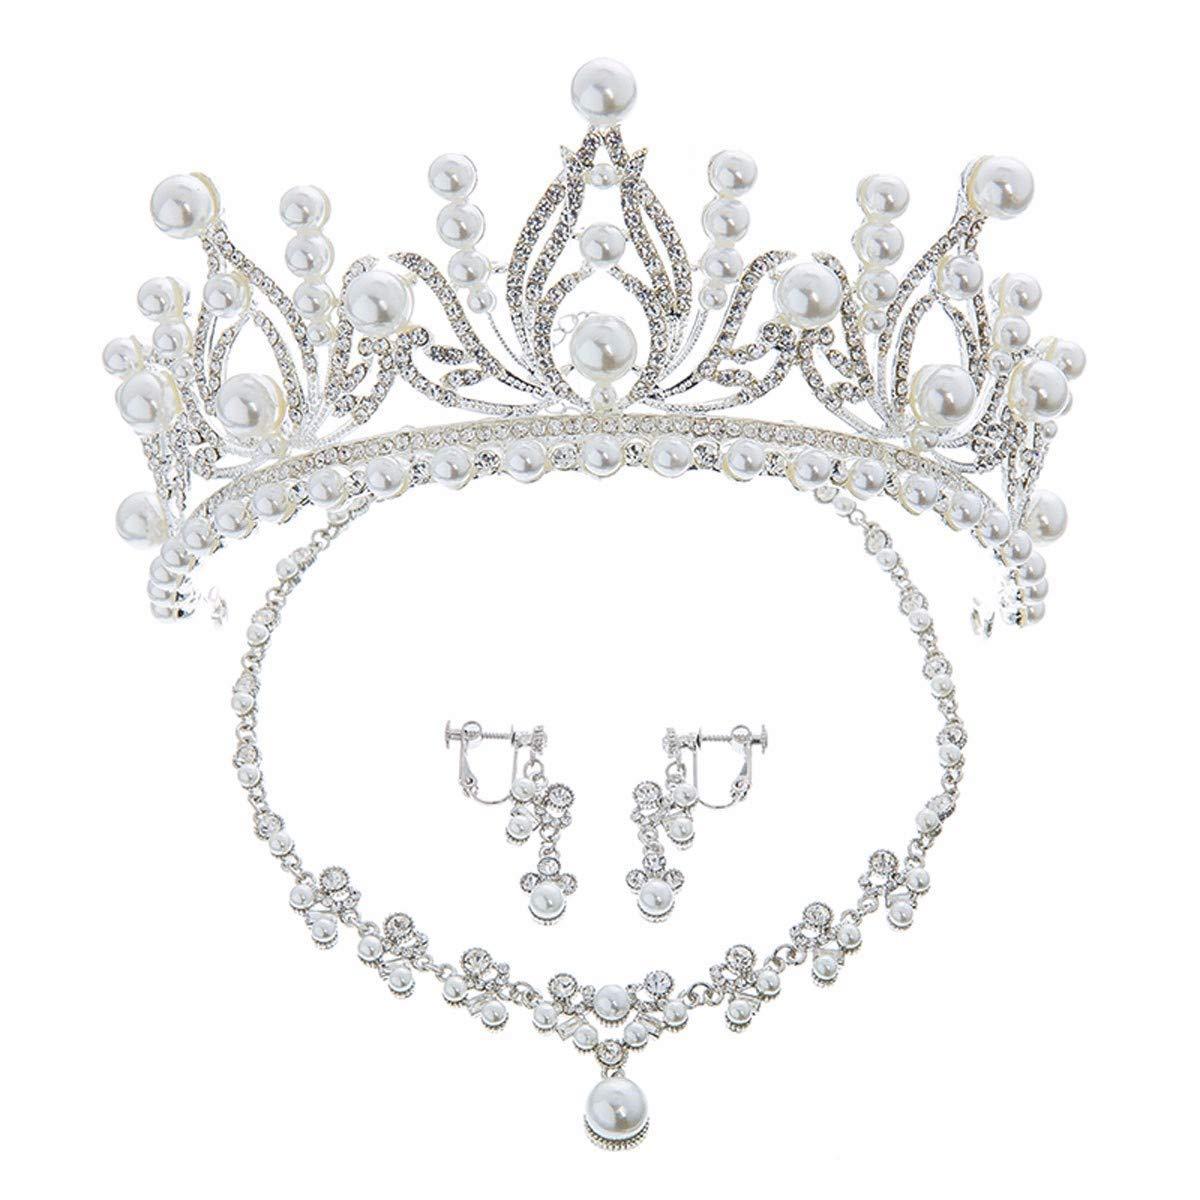 Girls Crown, Beautiful headdress/Bridal Headwear Crown Necklace Earrings Wedding Dresses Wedding Accessories